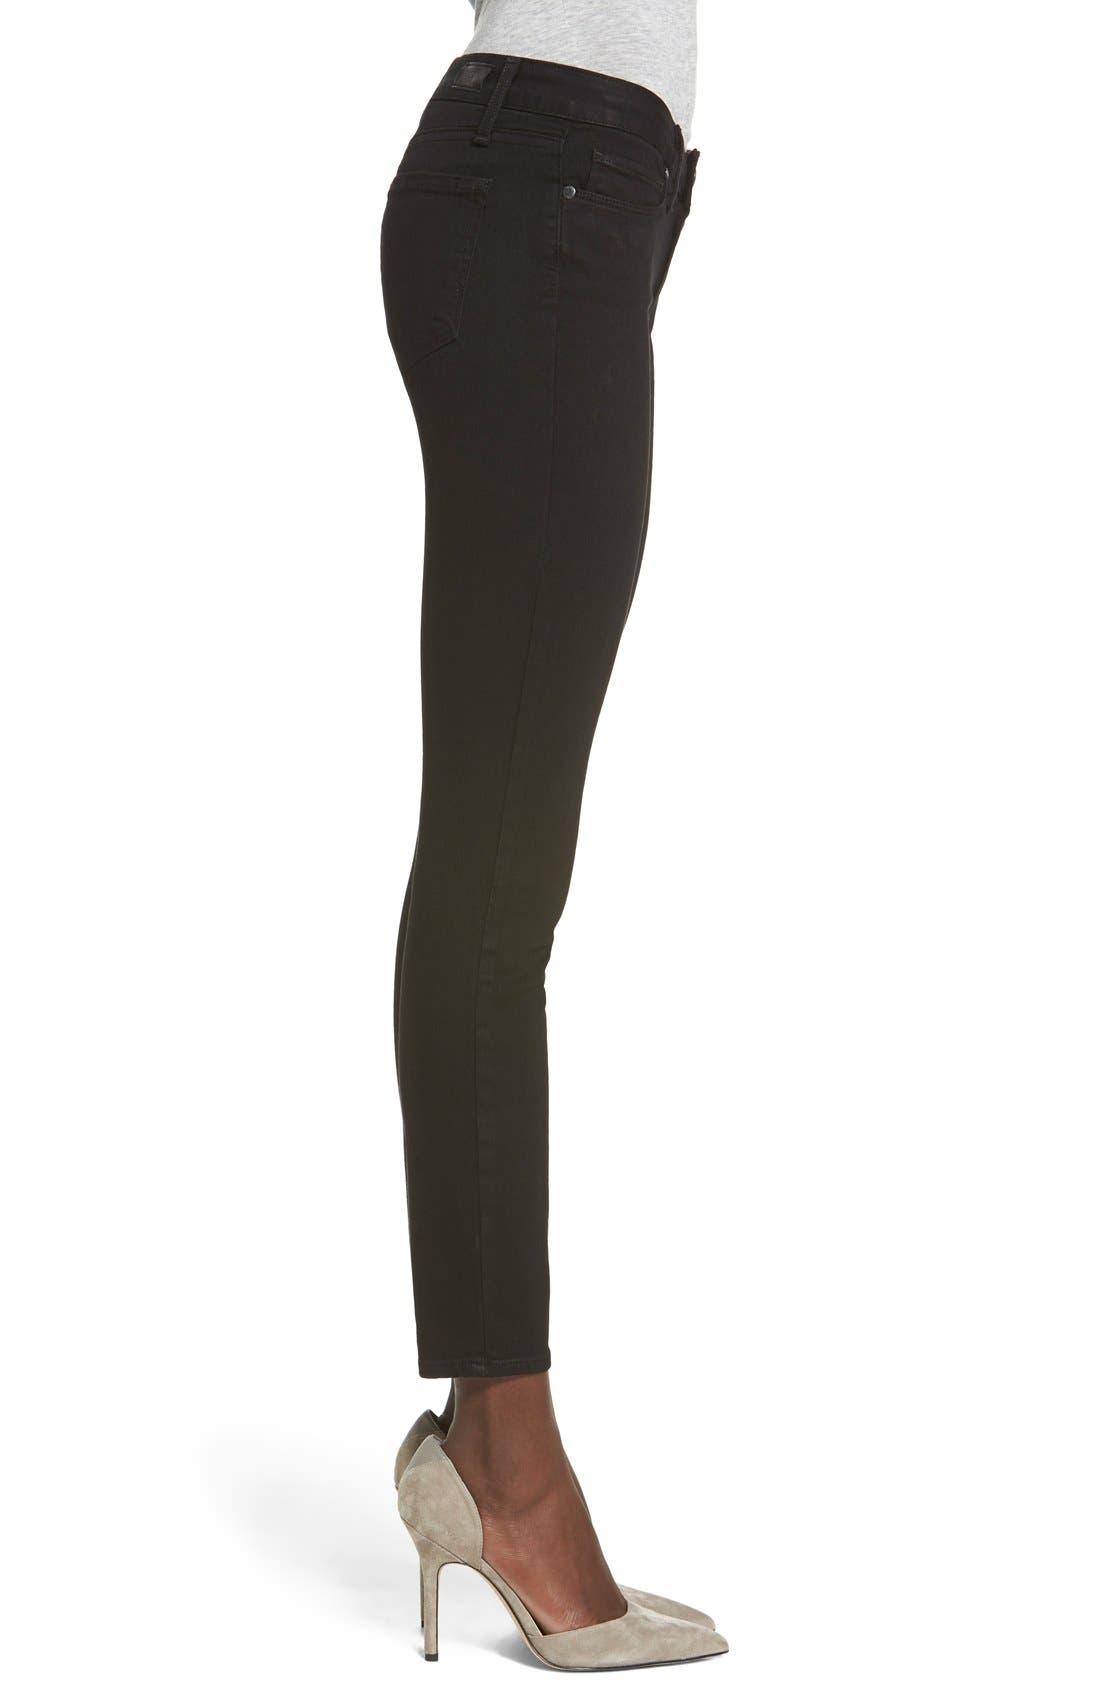 Transcend - Verdugo Ankle Ultra Skinny Jeans,                             Alternate thumbnail 10, color,                             BLACK SHADOW